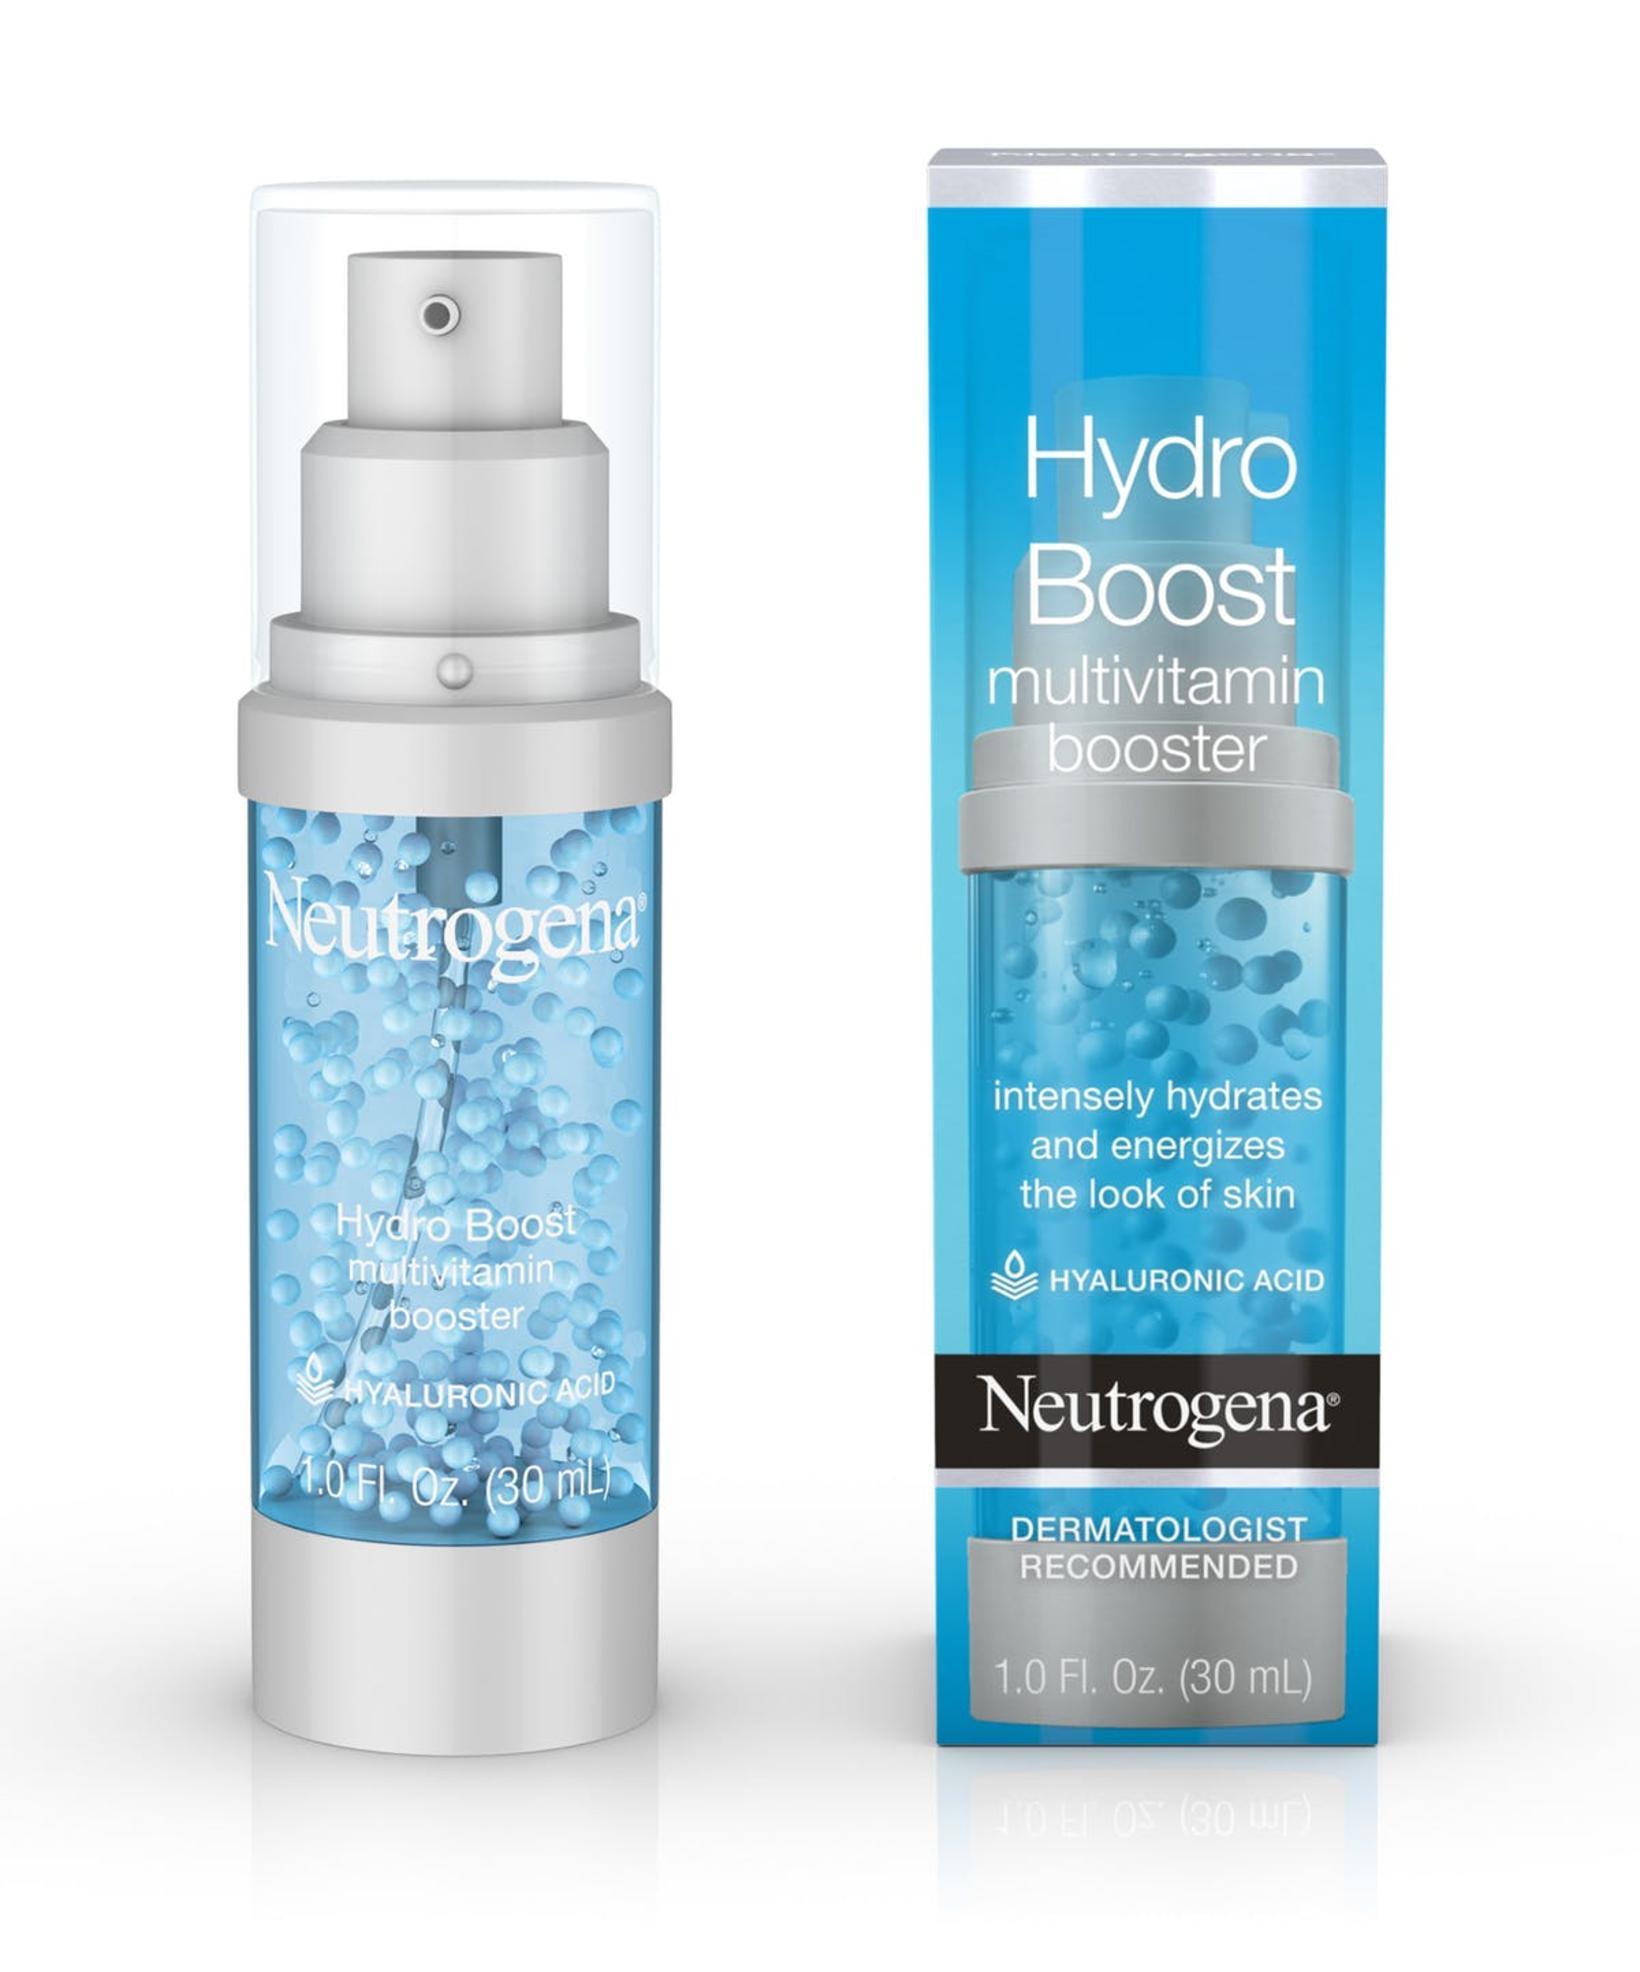 Rakel notar Hydro Boost-línuna frá Neutrogena.